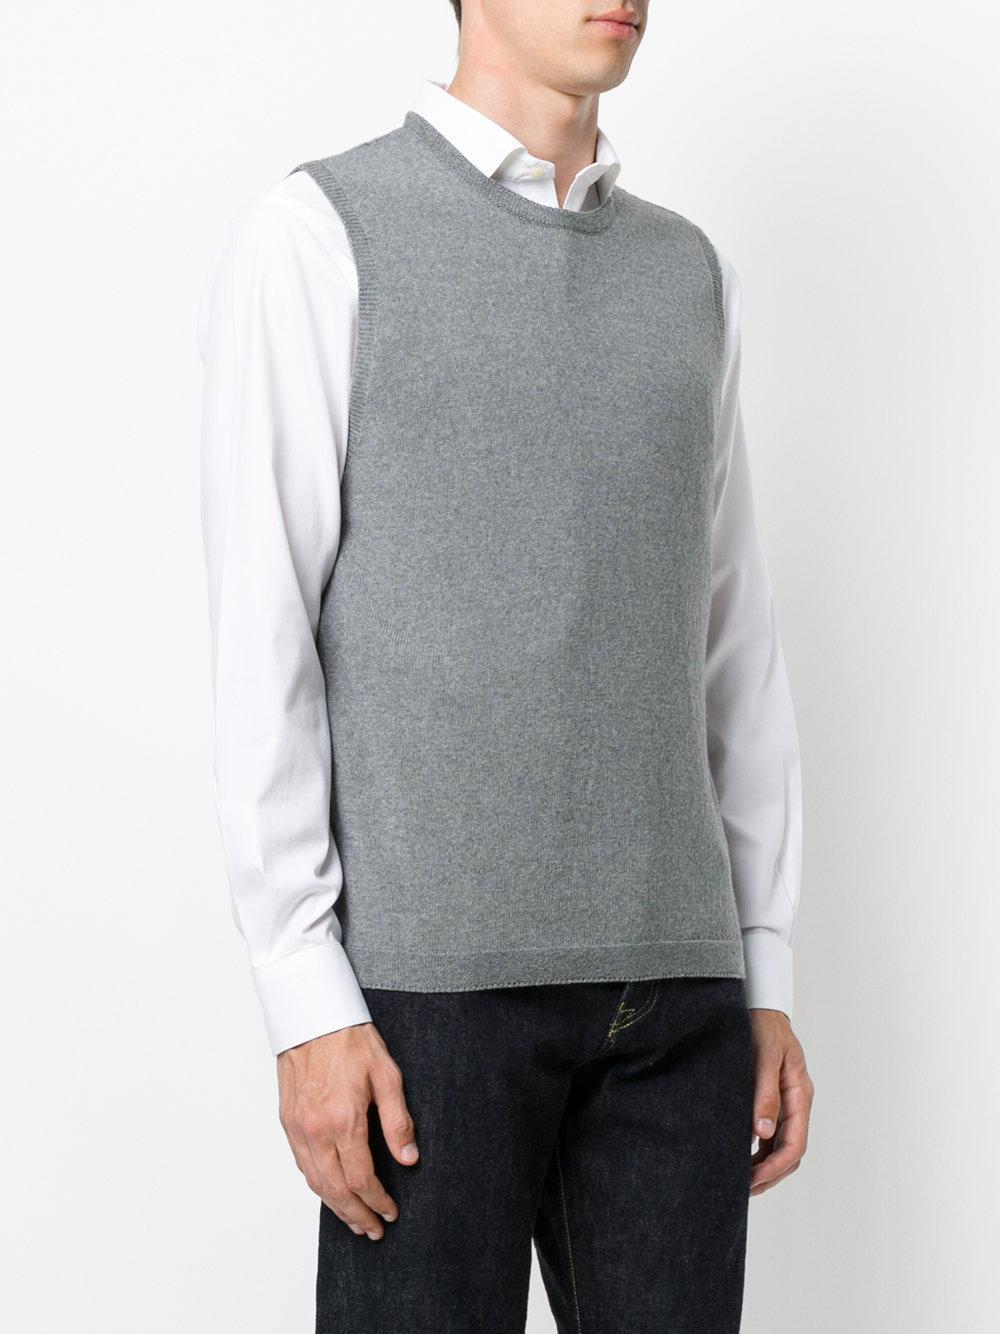 Etro Sleeveless Crew Neck Sweater in Gray for Men | Lyst